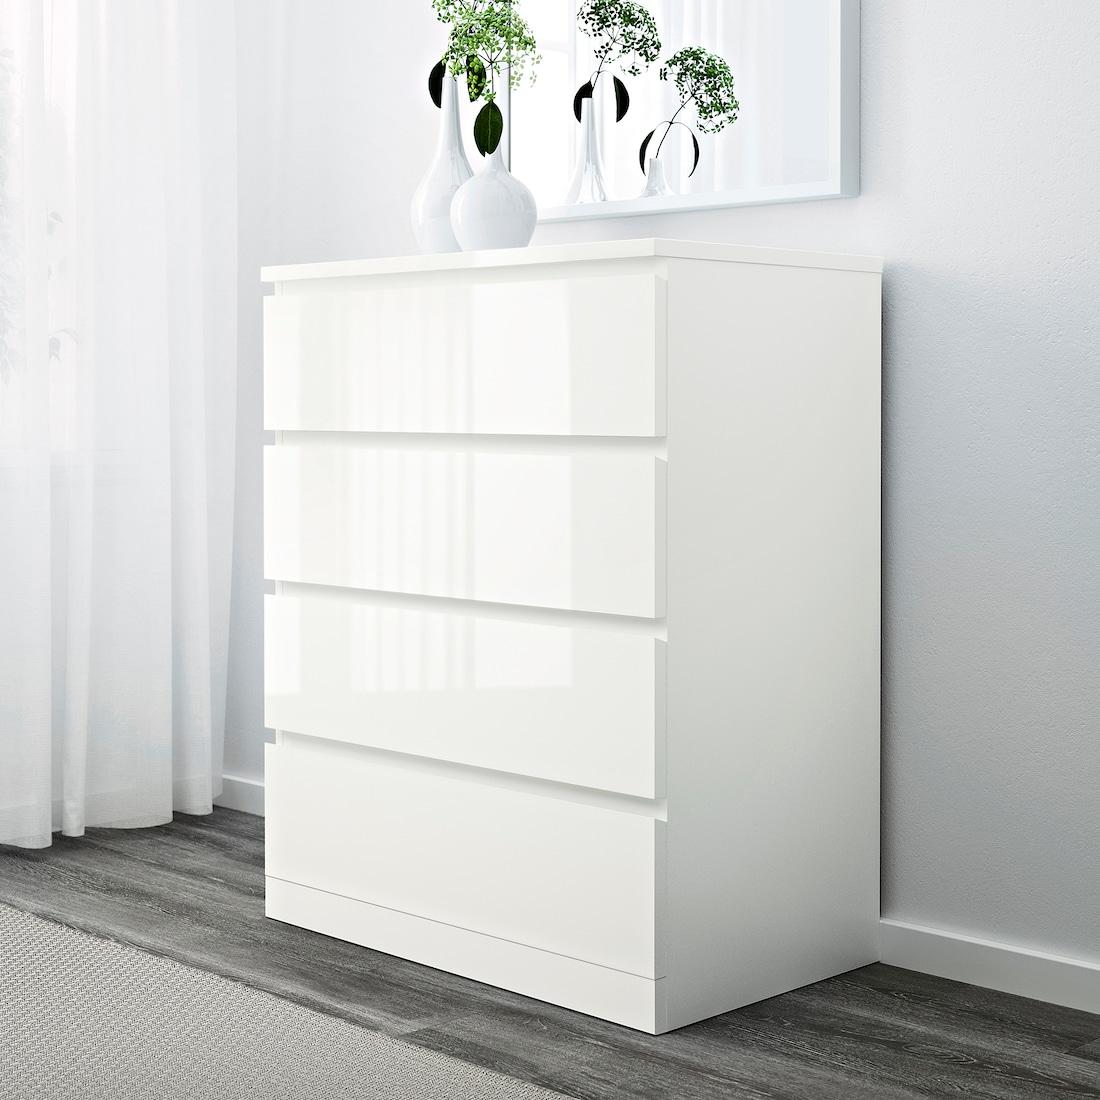 Ikea Malm Kommode Hochglanz 2021